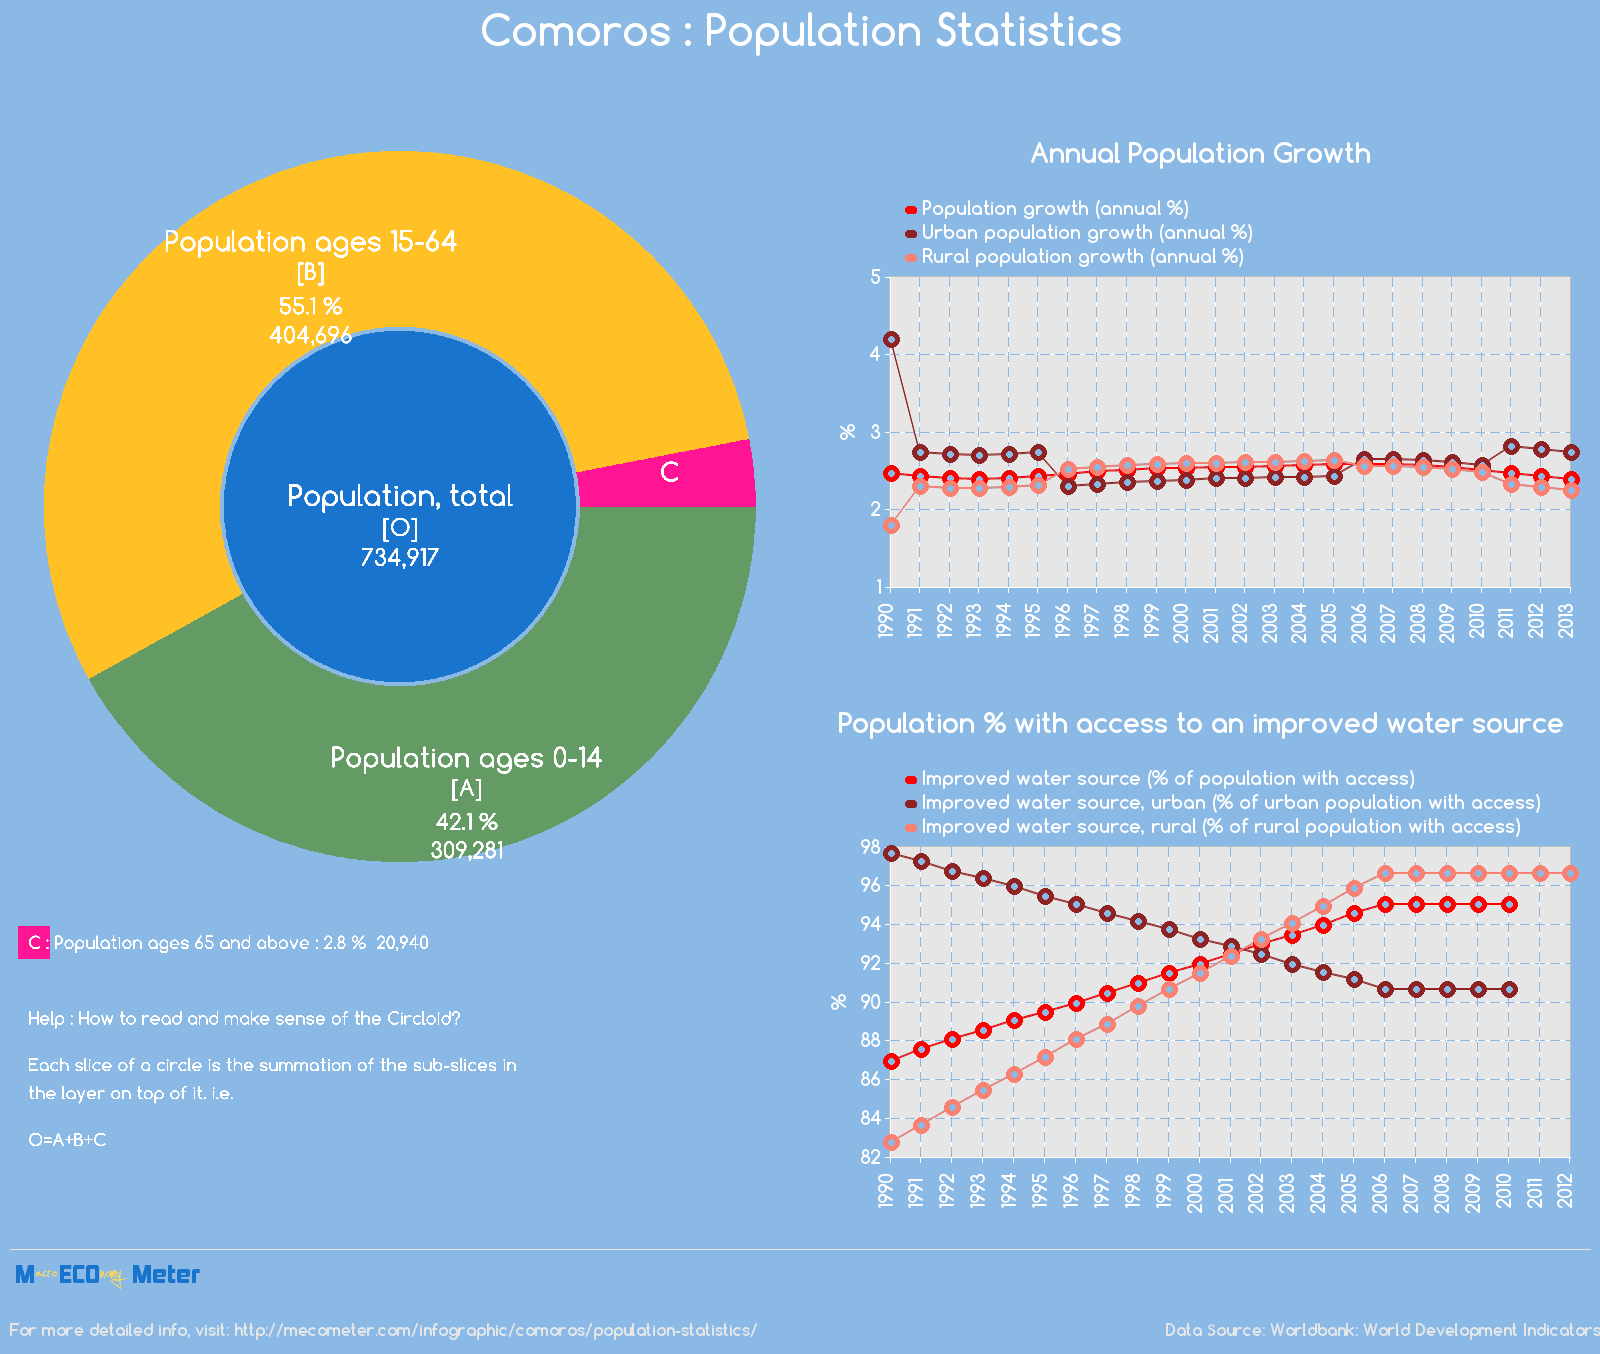 Comoros : Population Statistics